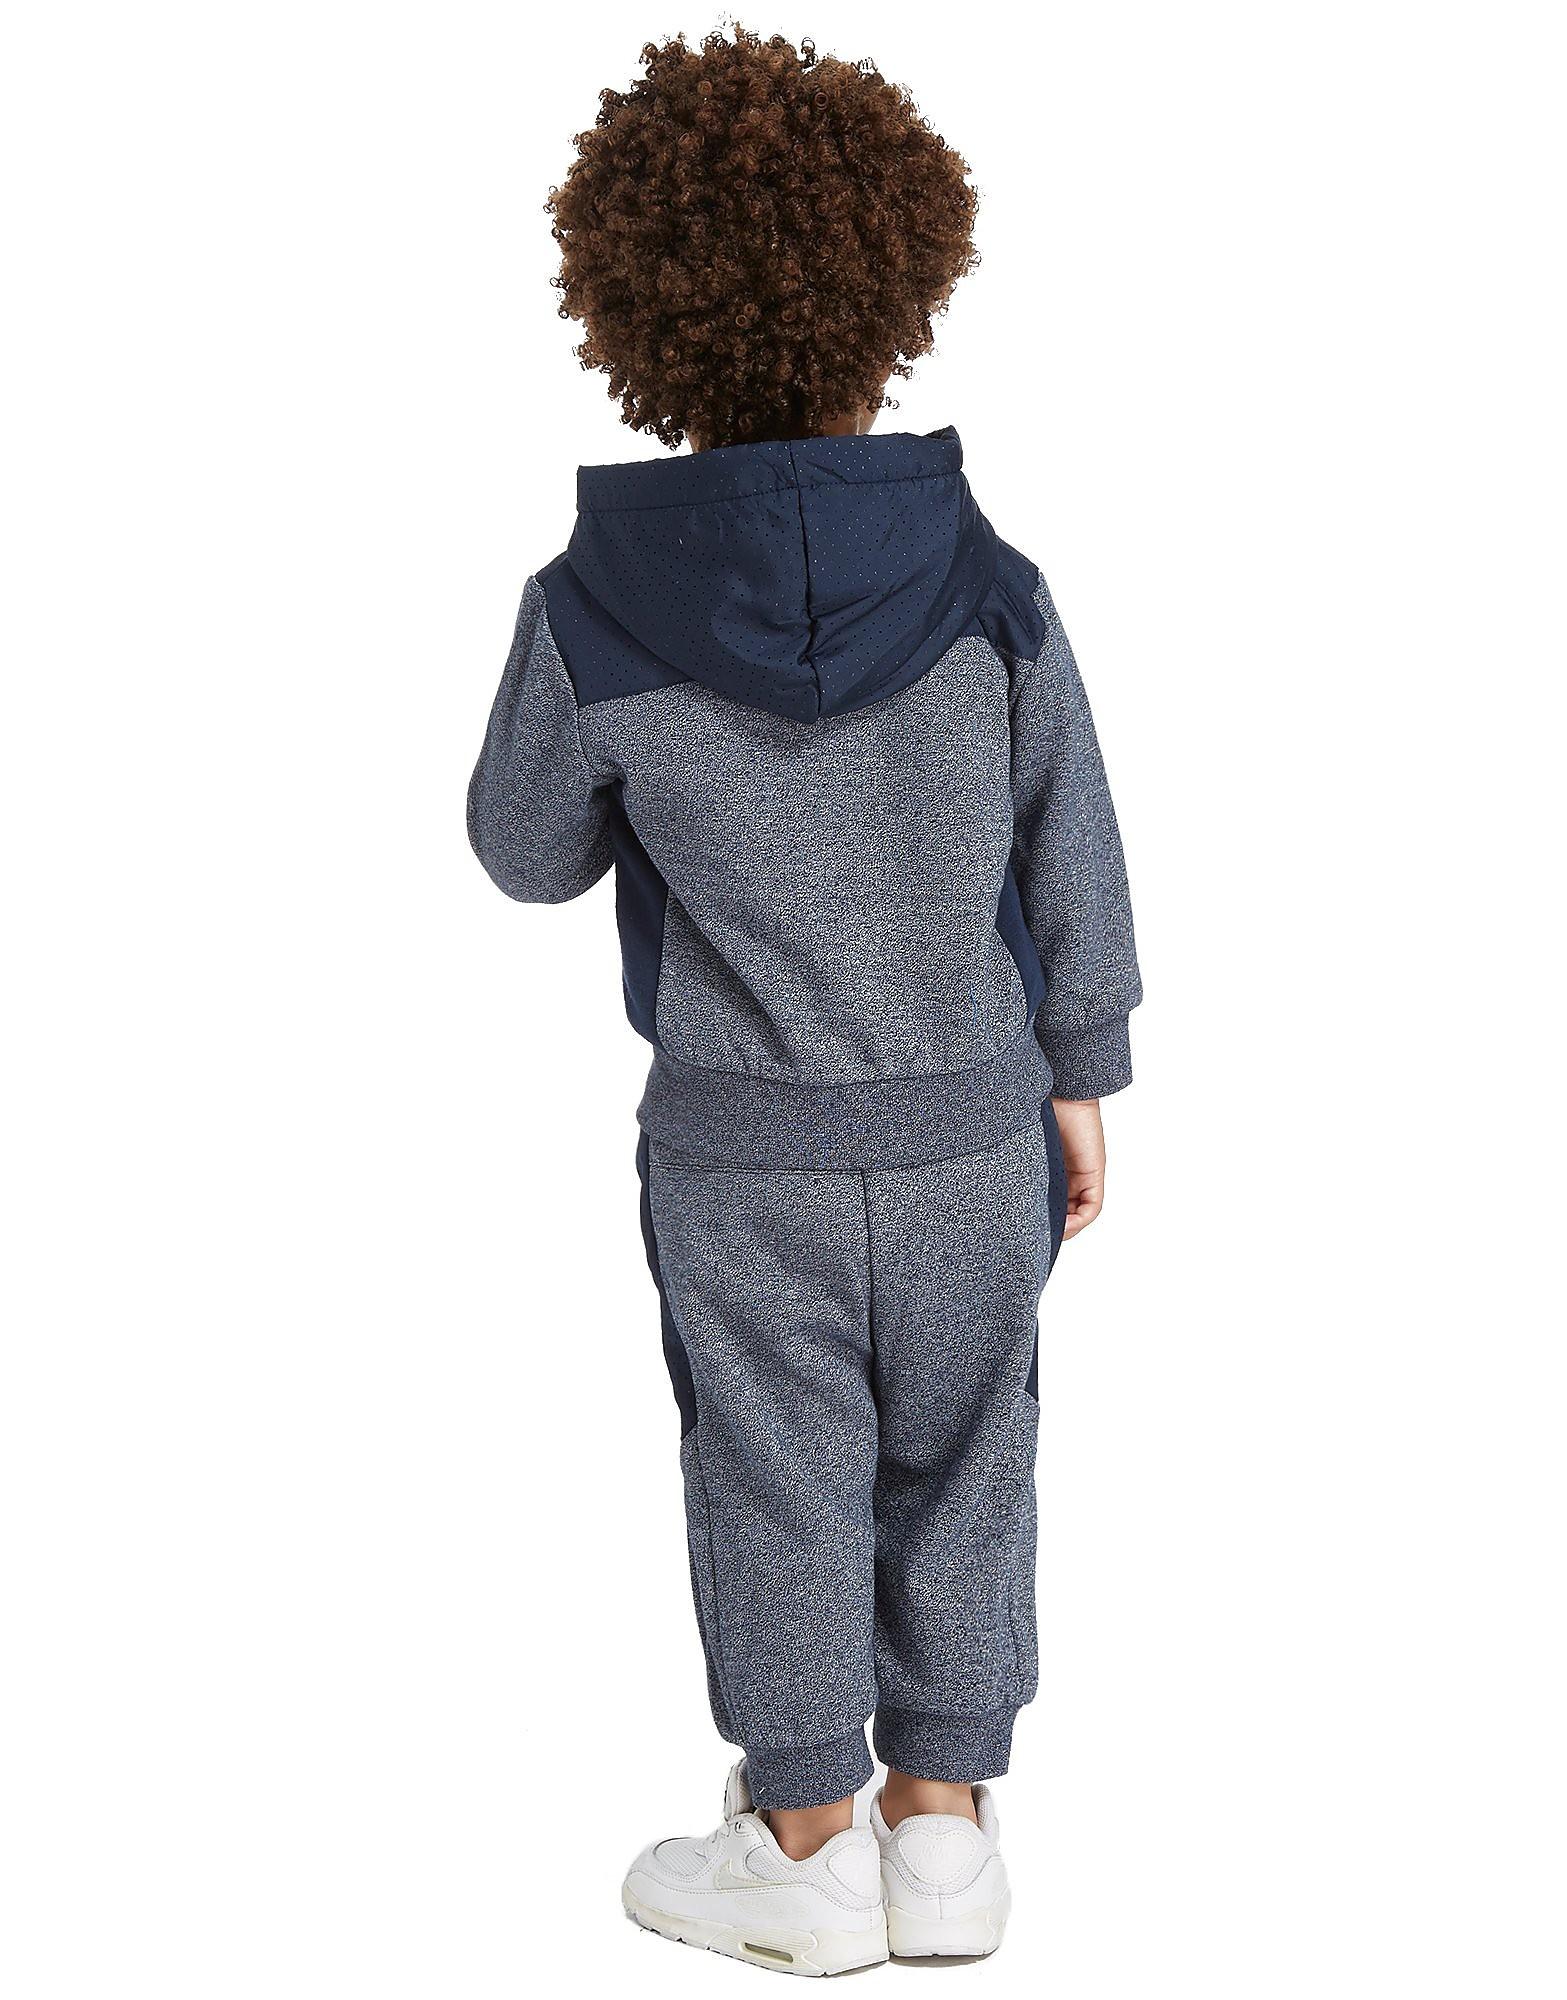 McKenzie Wally Overlay Tracksuit Infant